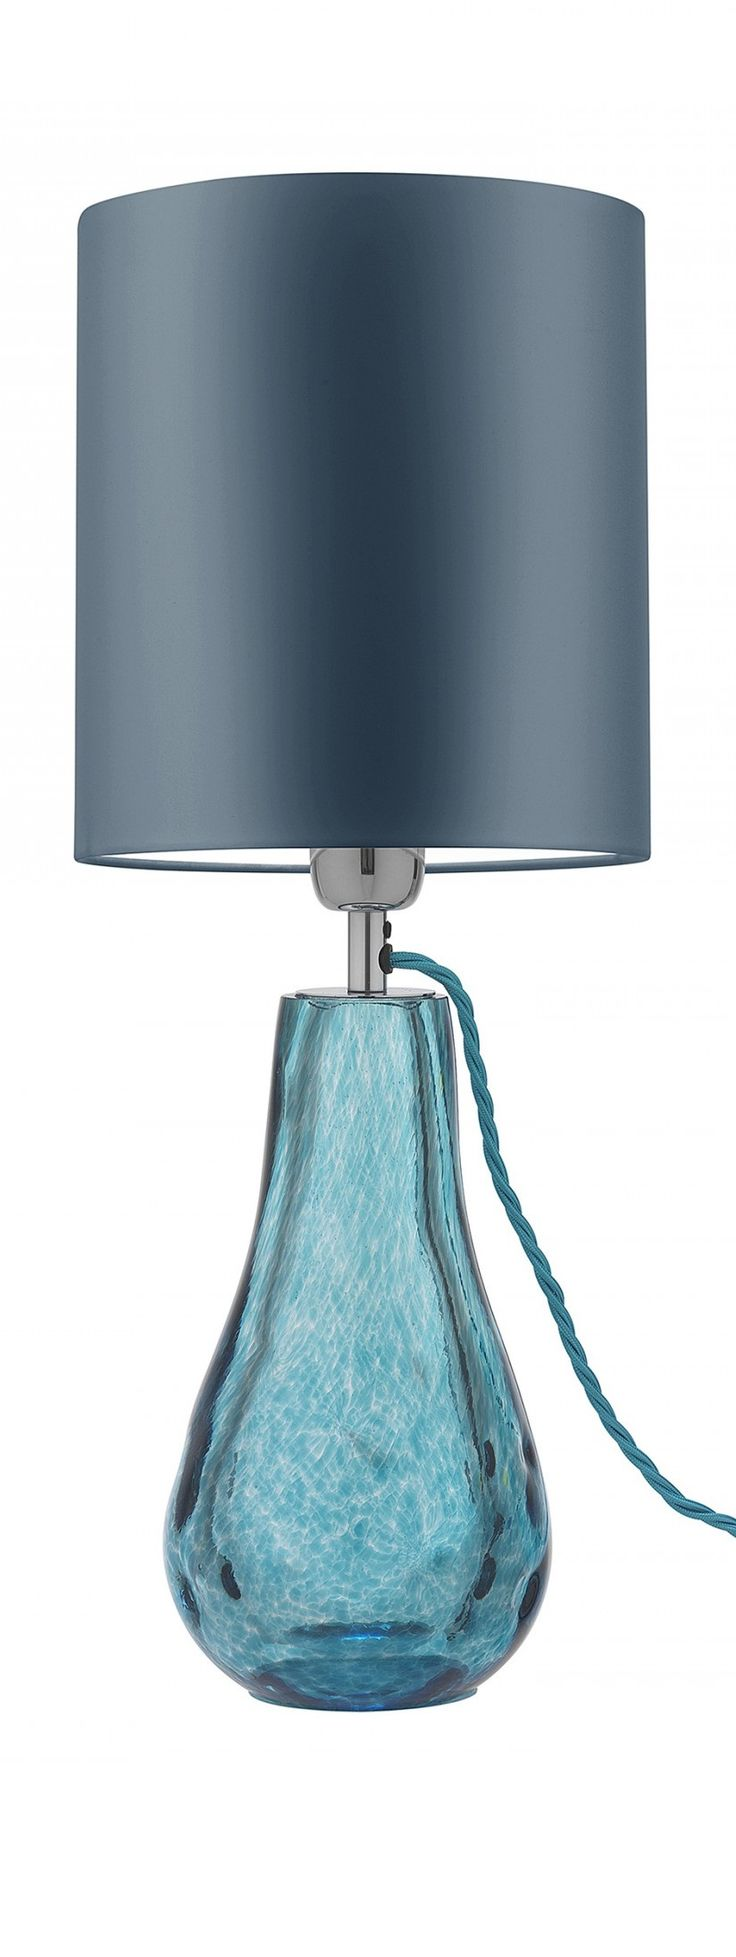 "Best 78 ""Blue Lamp"" ideas on Pinterest"